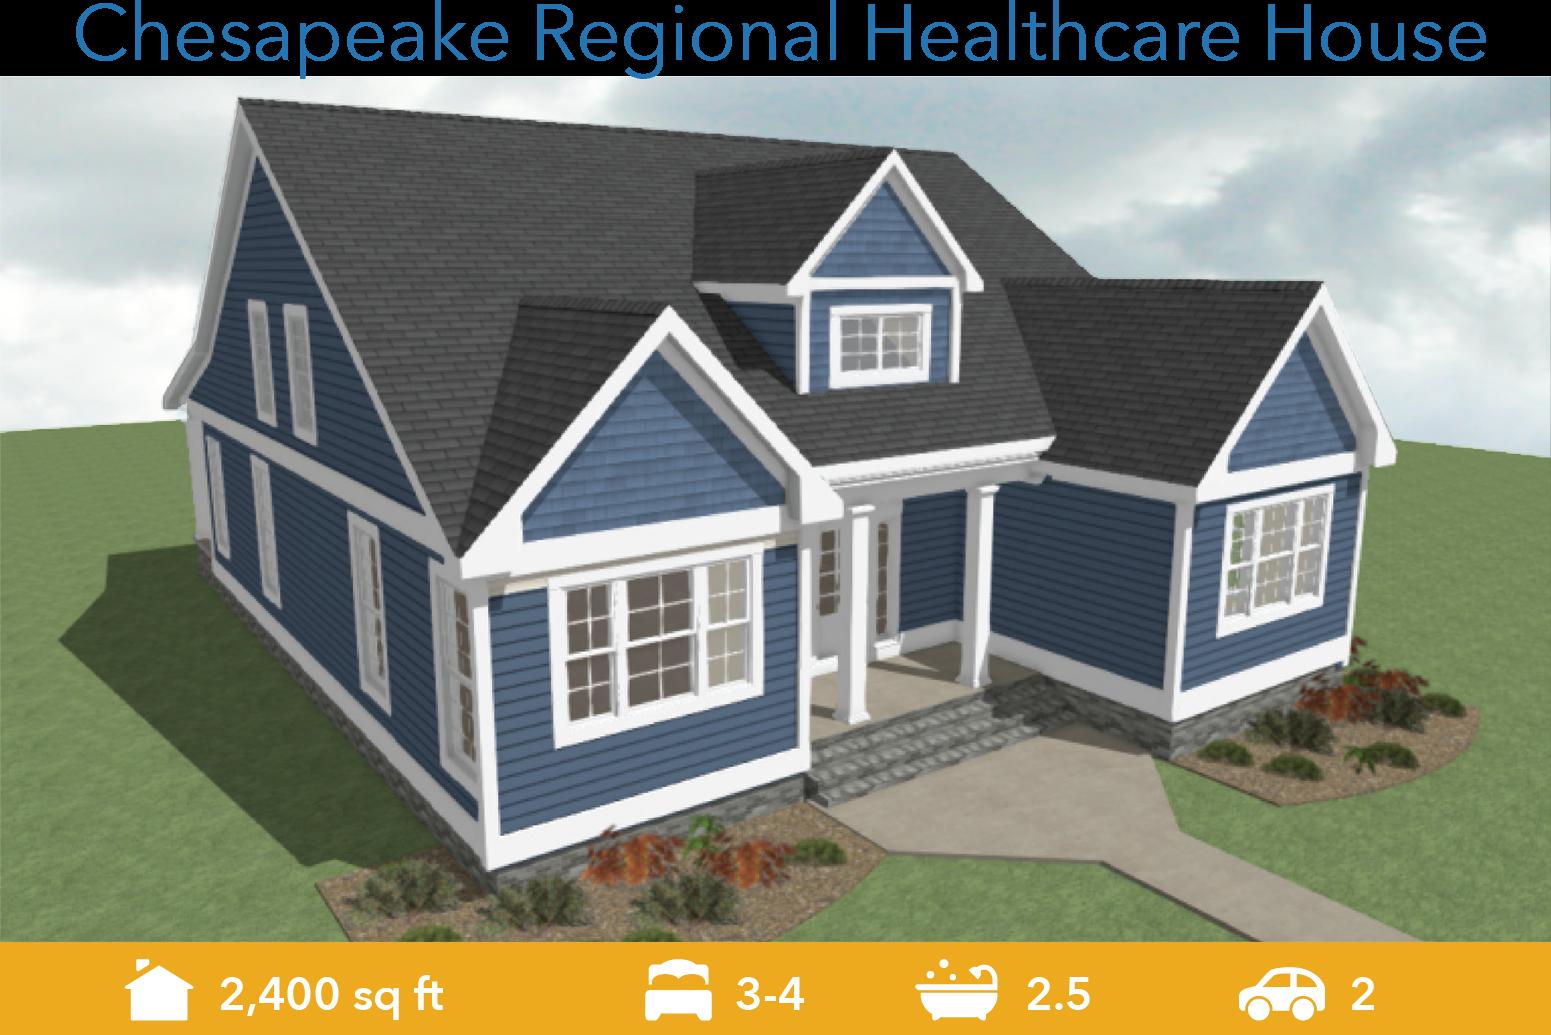 Home5-rendering.png